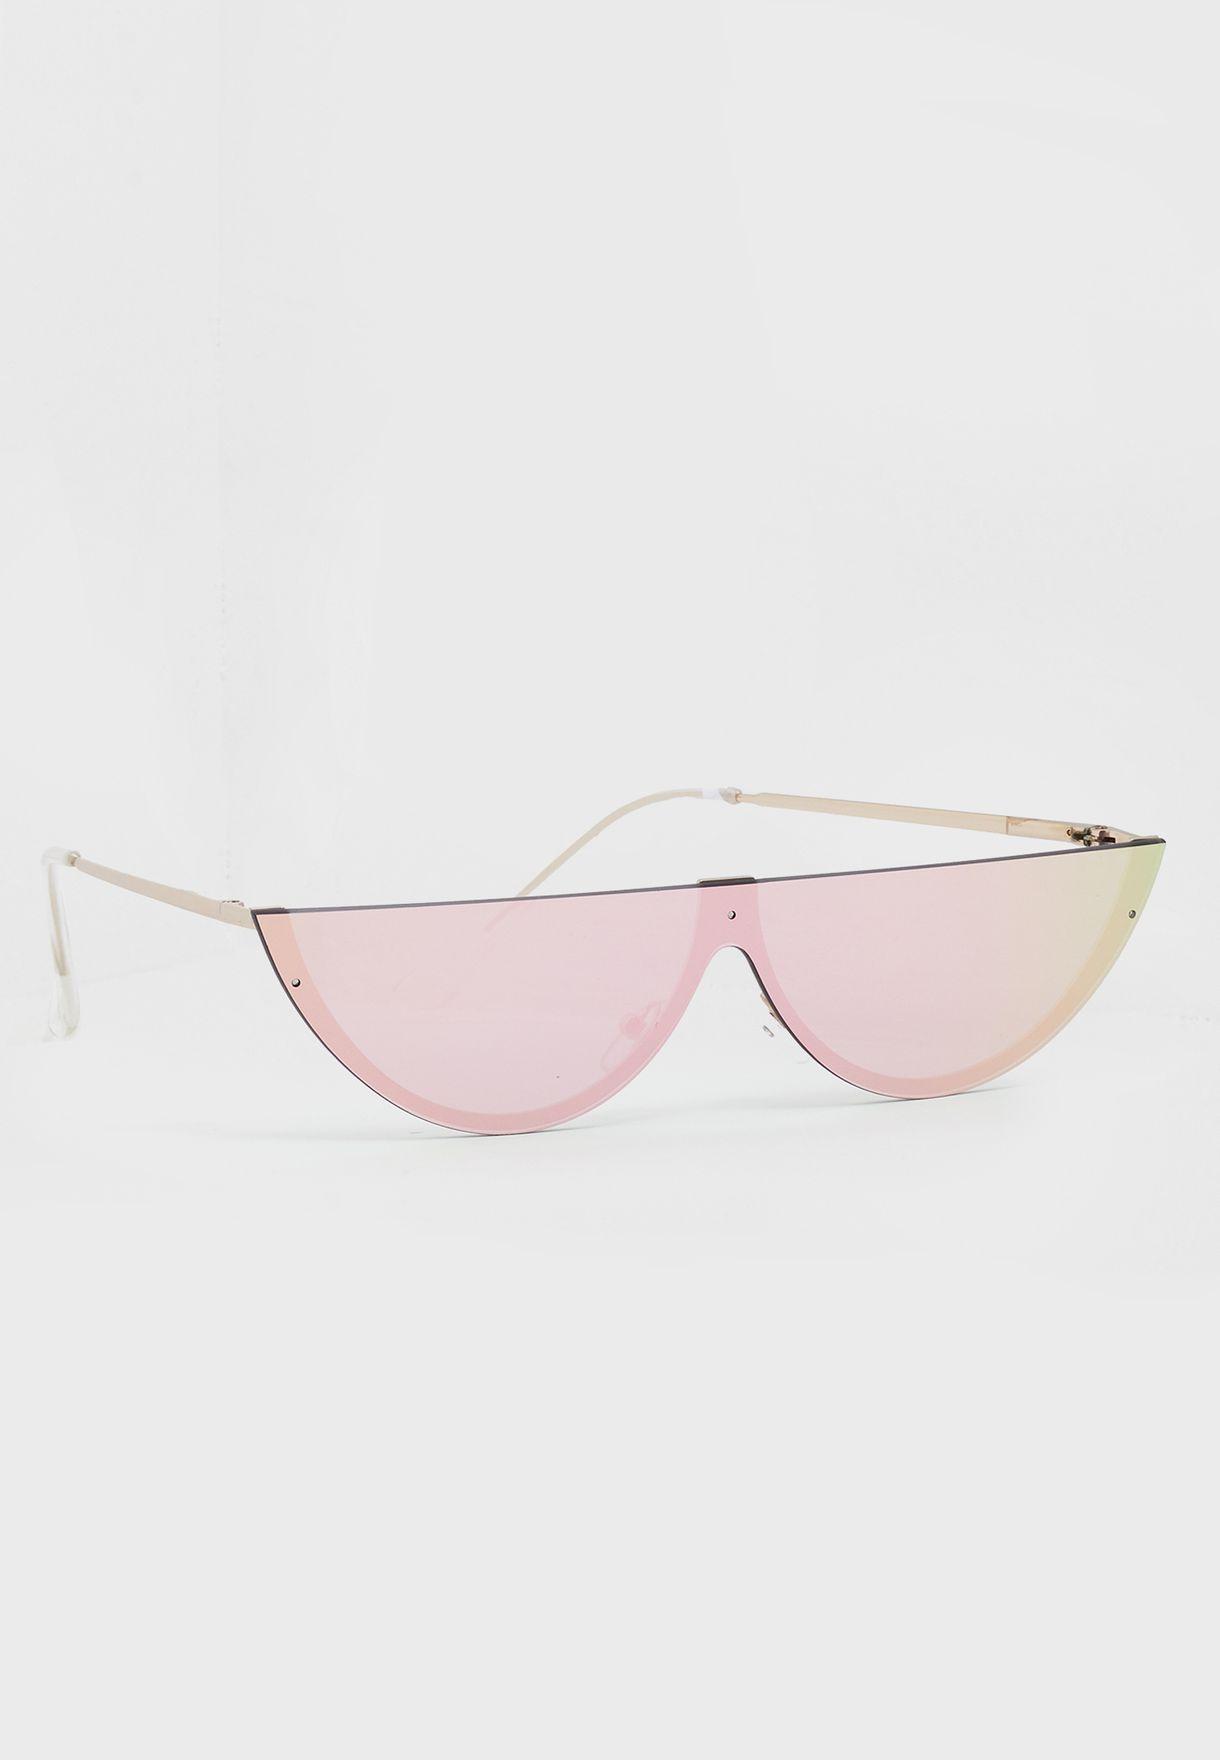 Sollyra Sunglasses